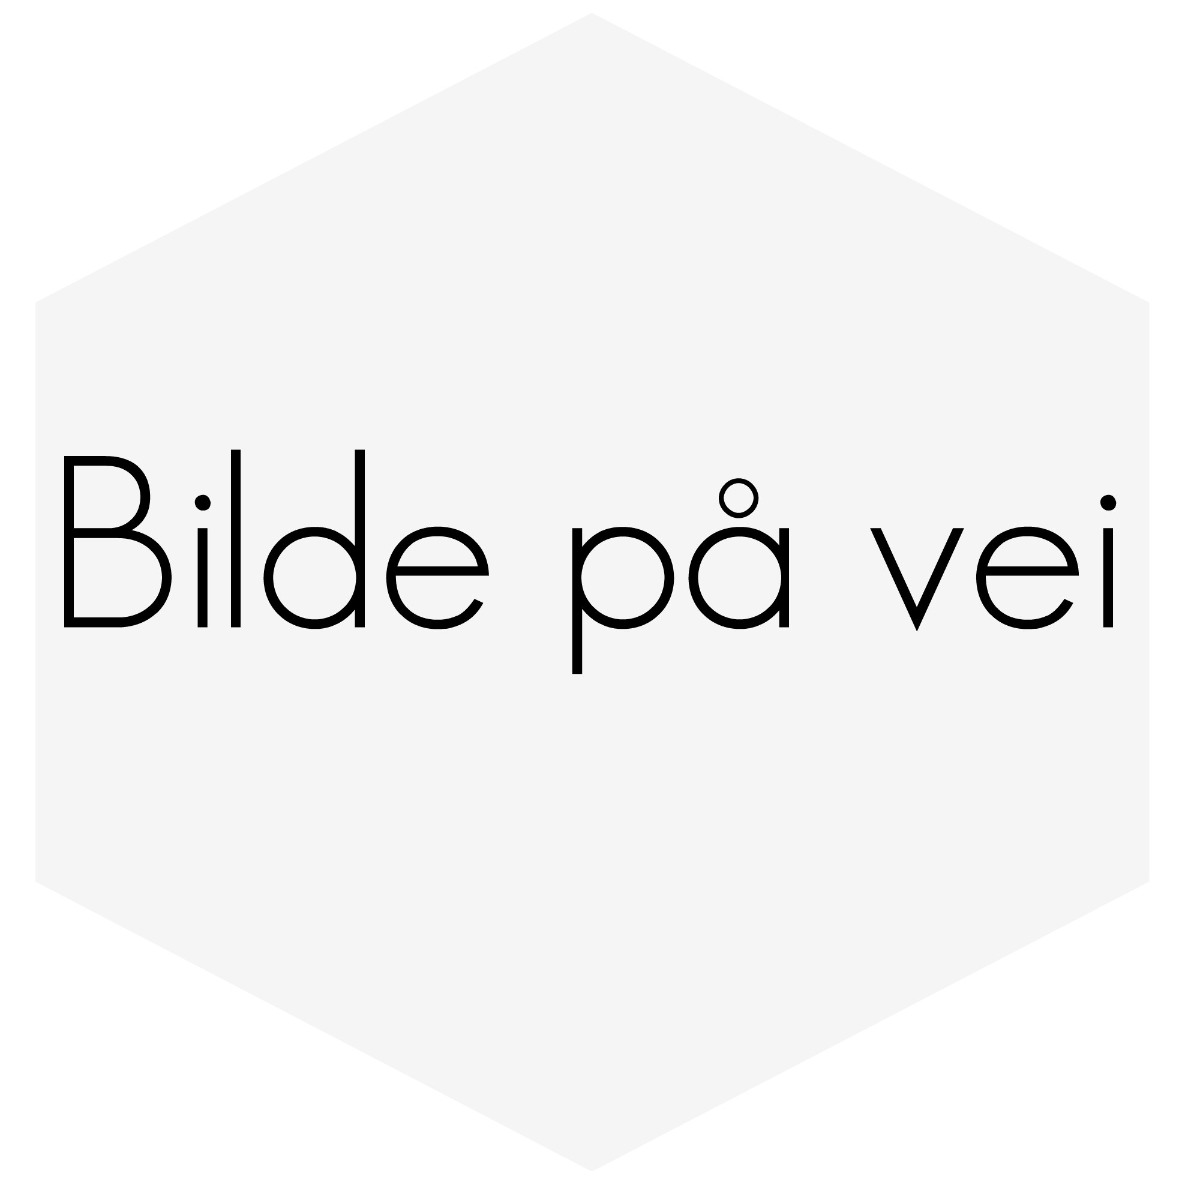 PEDALGUMMI ORG TYPE.AMAZ.140,200,700 se og51.2021,PG-021